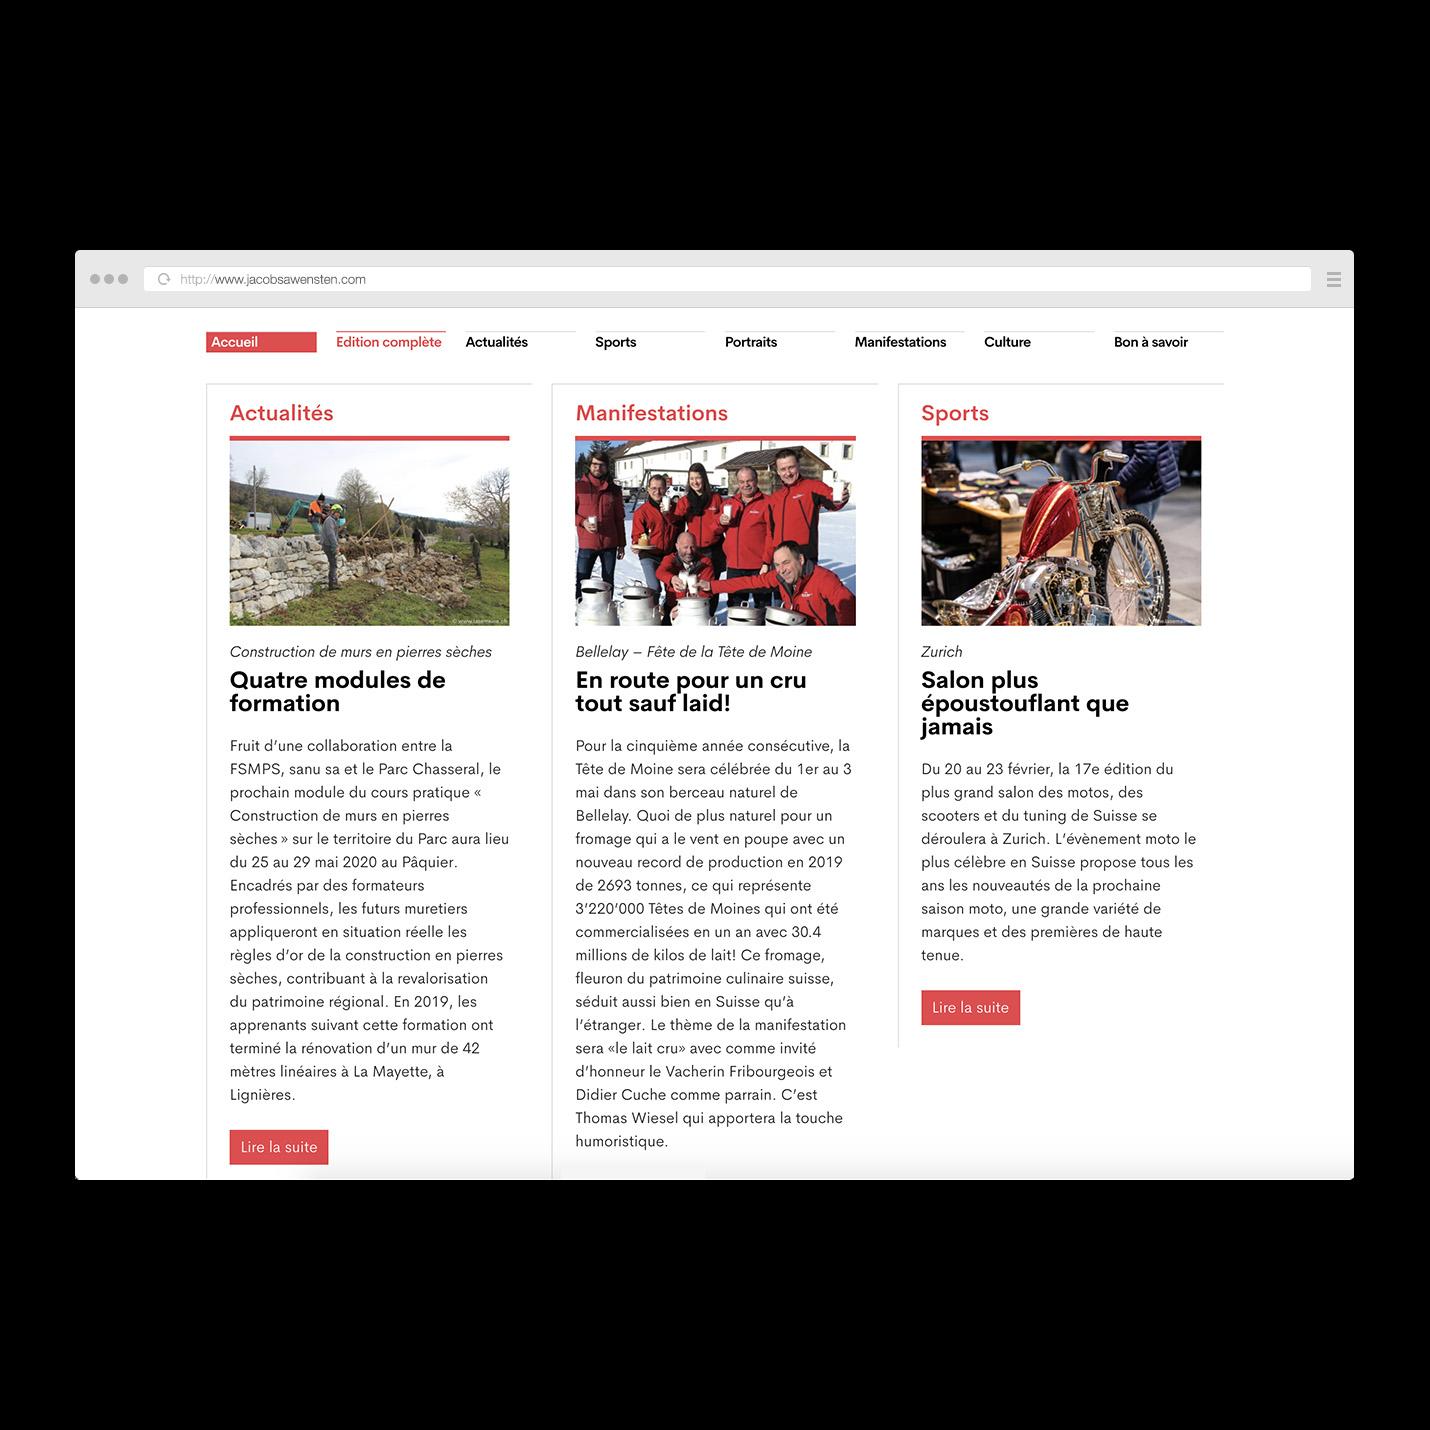 La Semaine site web